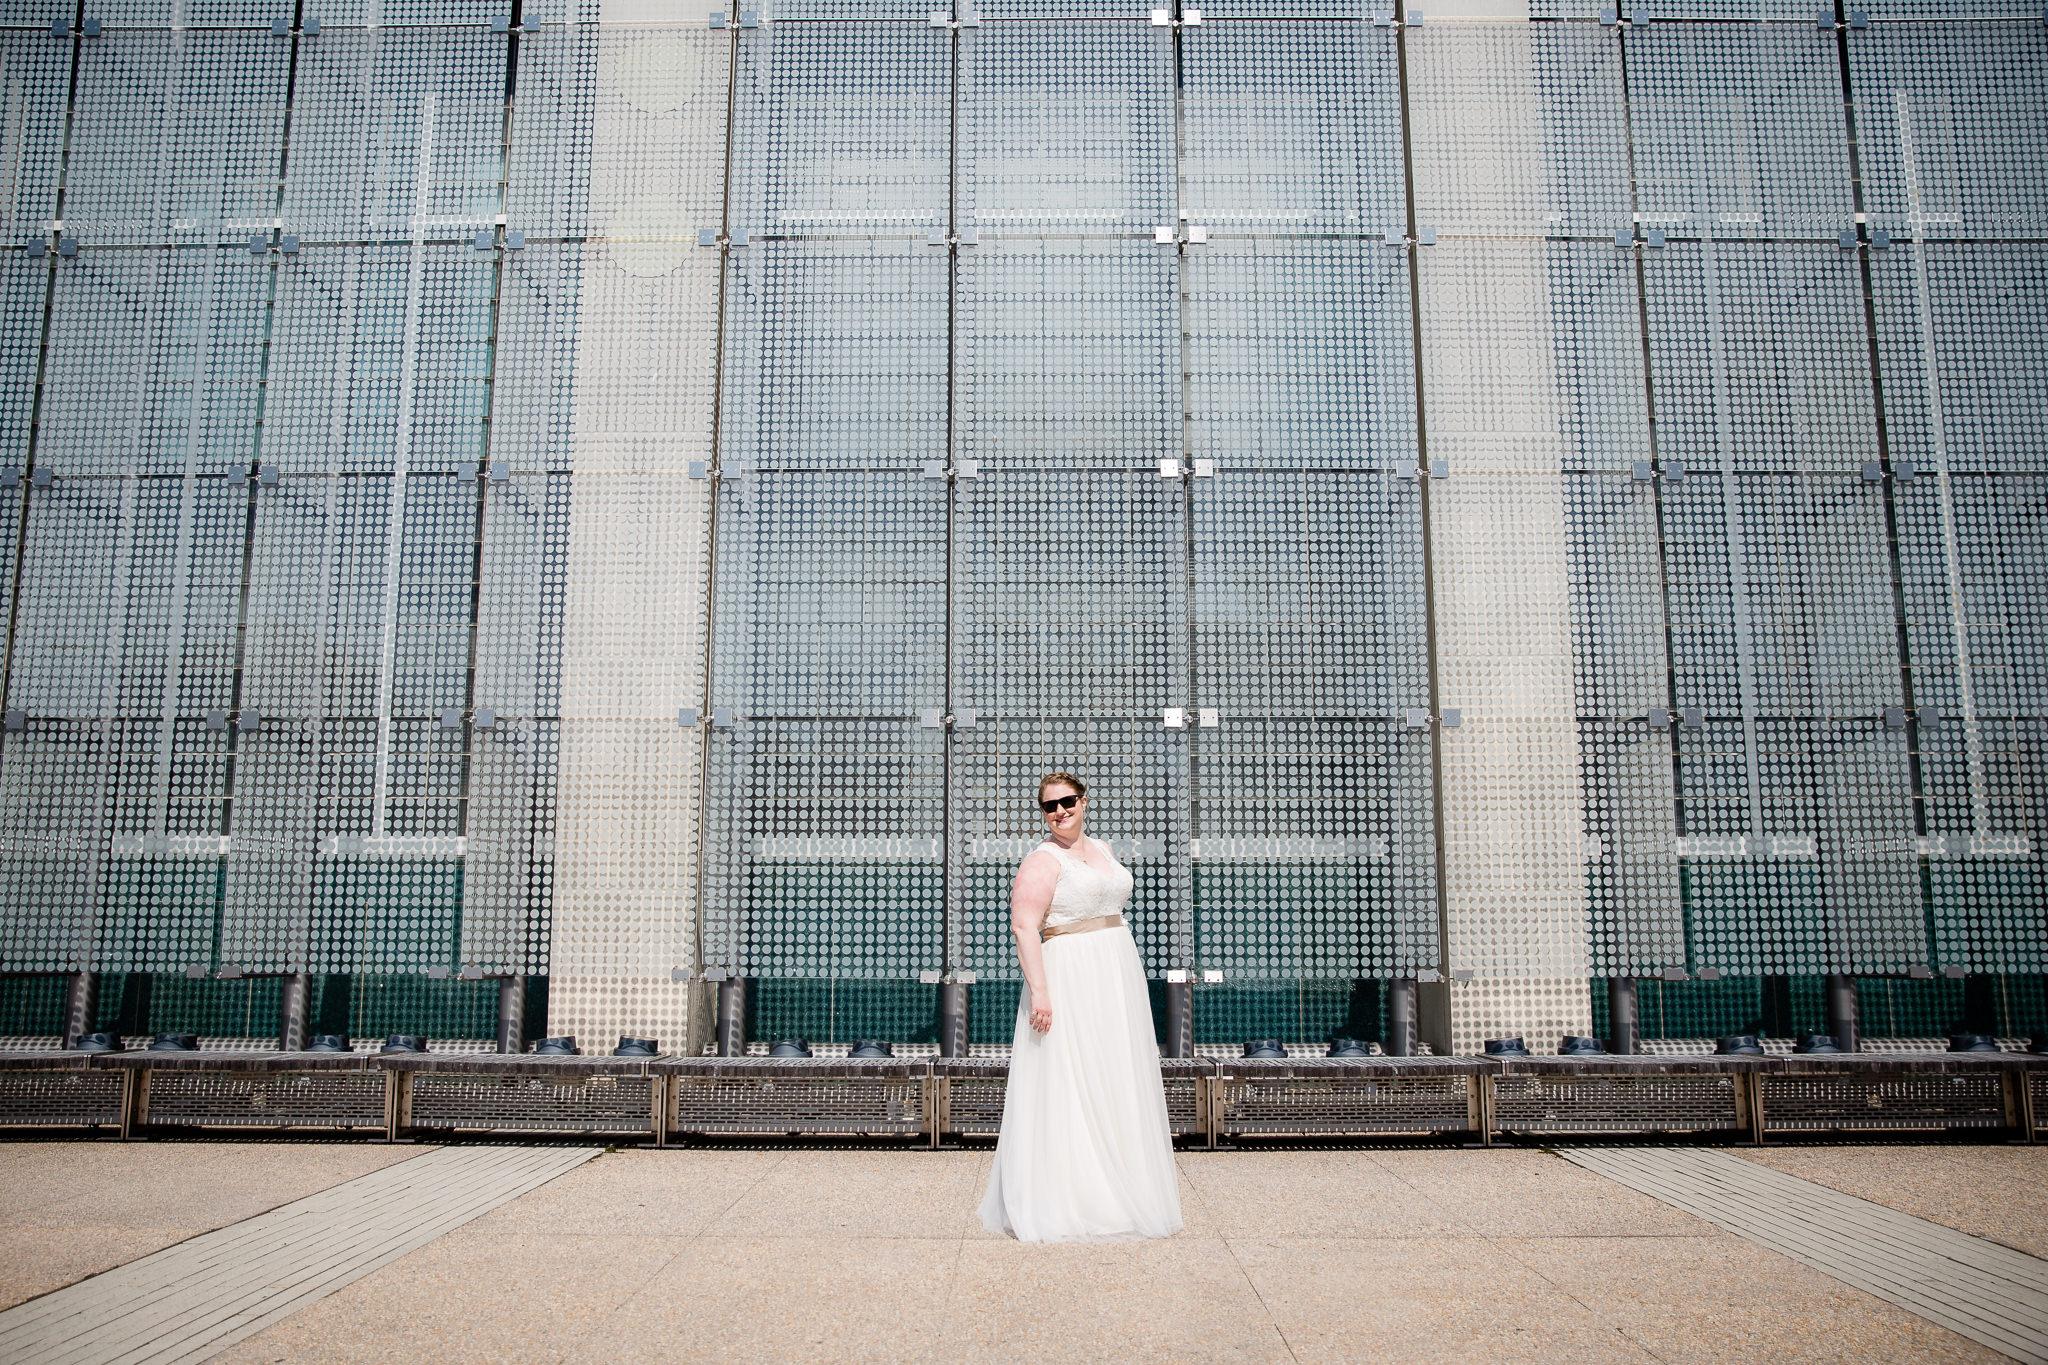 New York Wedding Photographer, New York Wedding Photos, Queens New York Weddings, Terrace on the Park Wedding Photos, Queens New York Corona Park Wedding, New York City Wedding Photographer